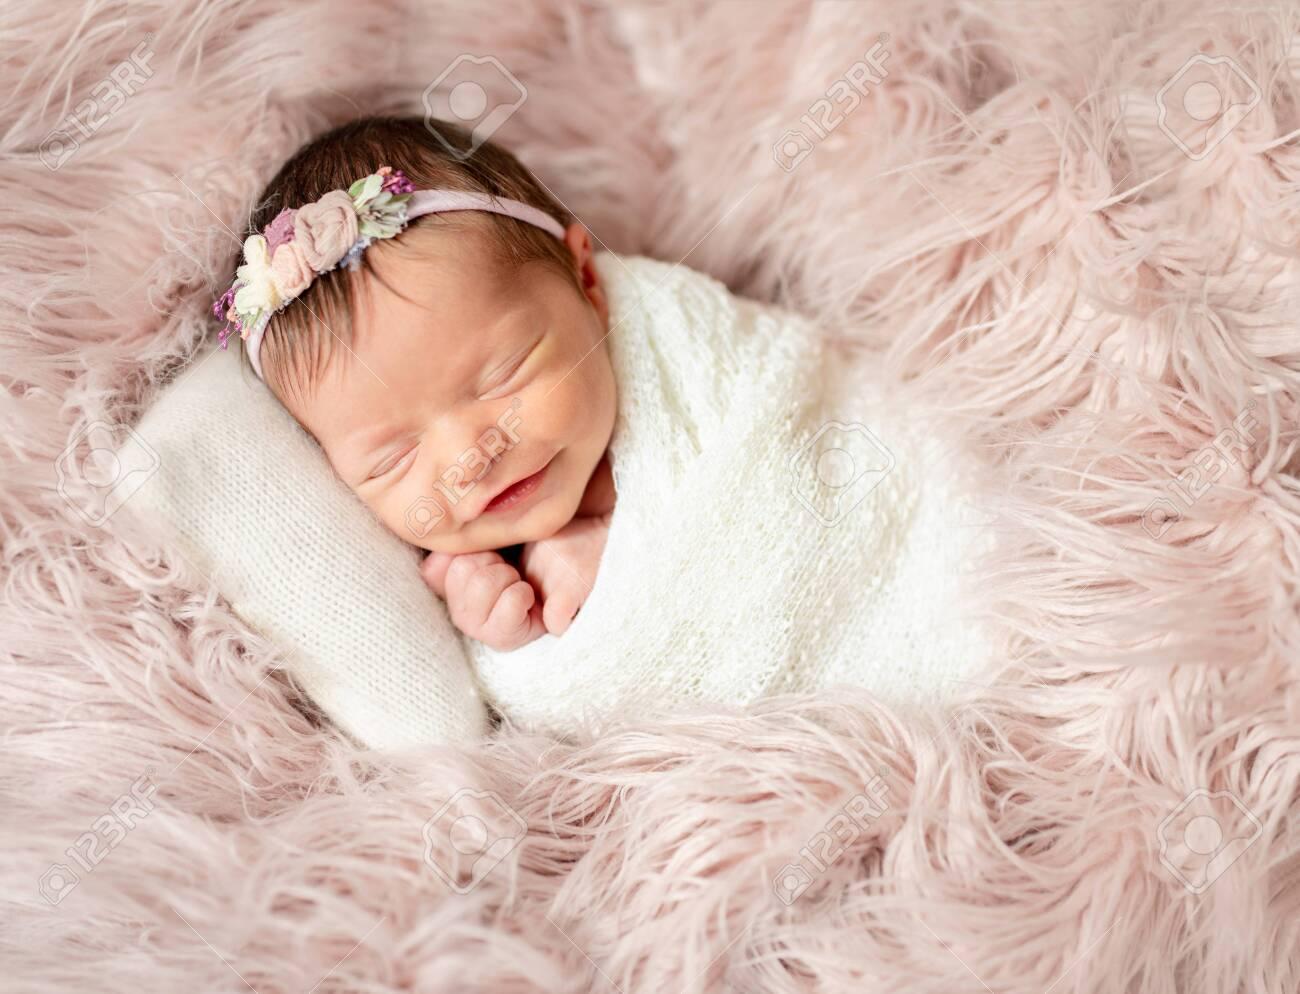 newborn sleeping on baby bed - 121651036